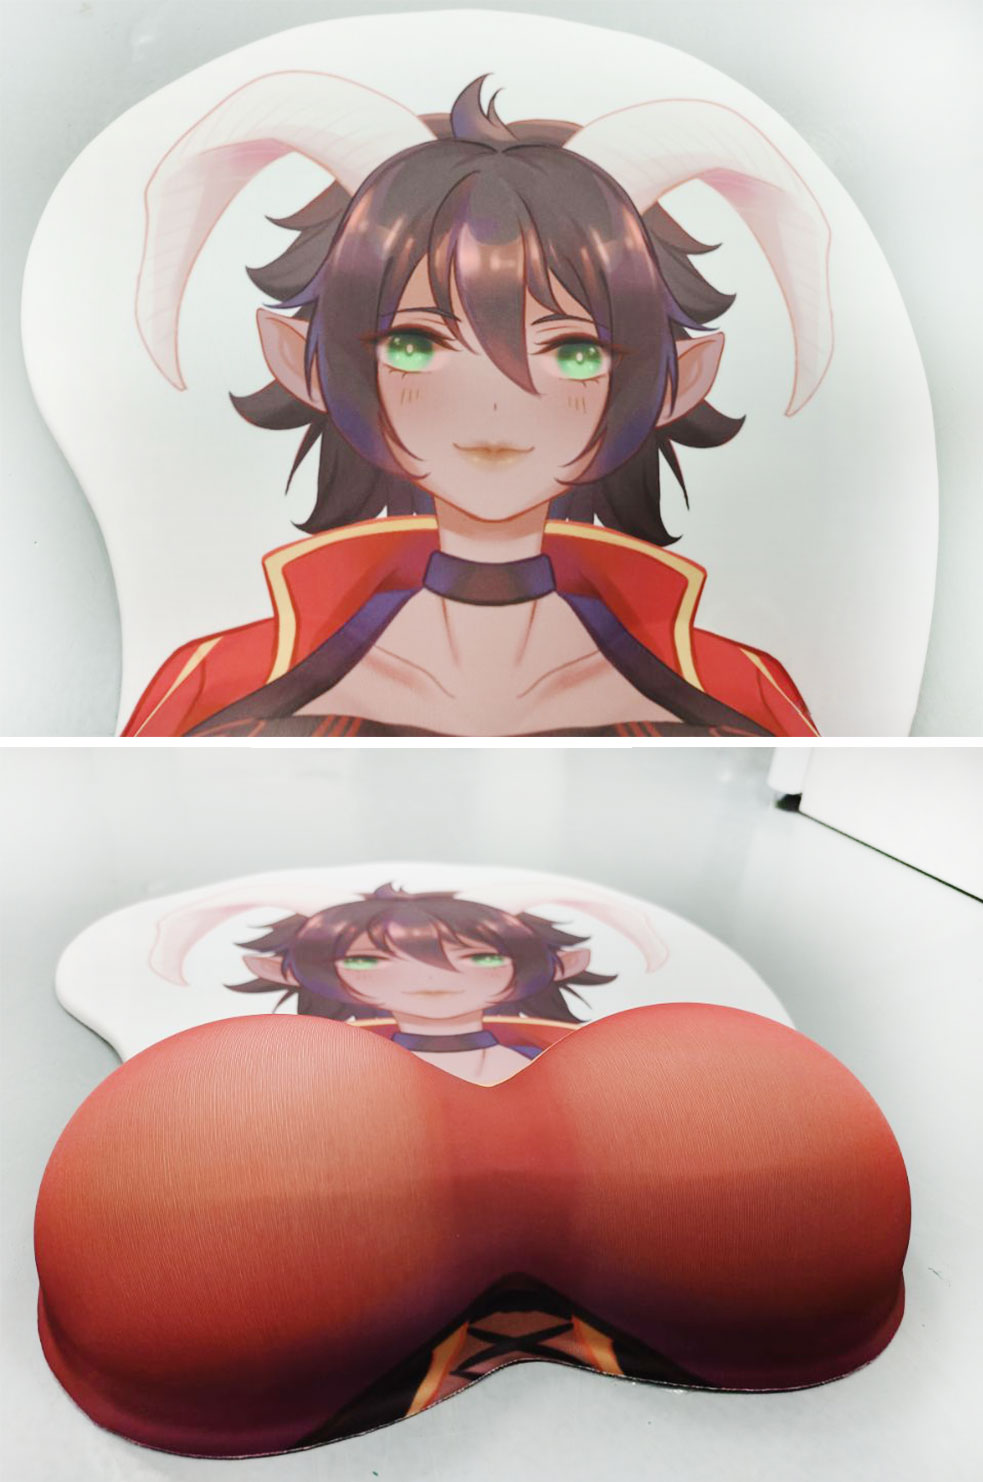 tyrande life size oppai mousepad 5384 - Anime Mousepads